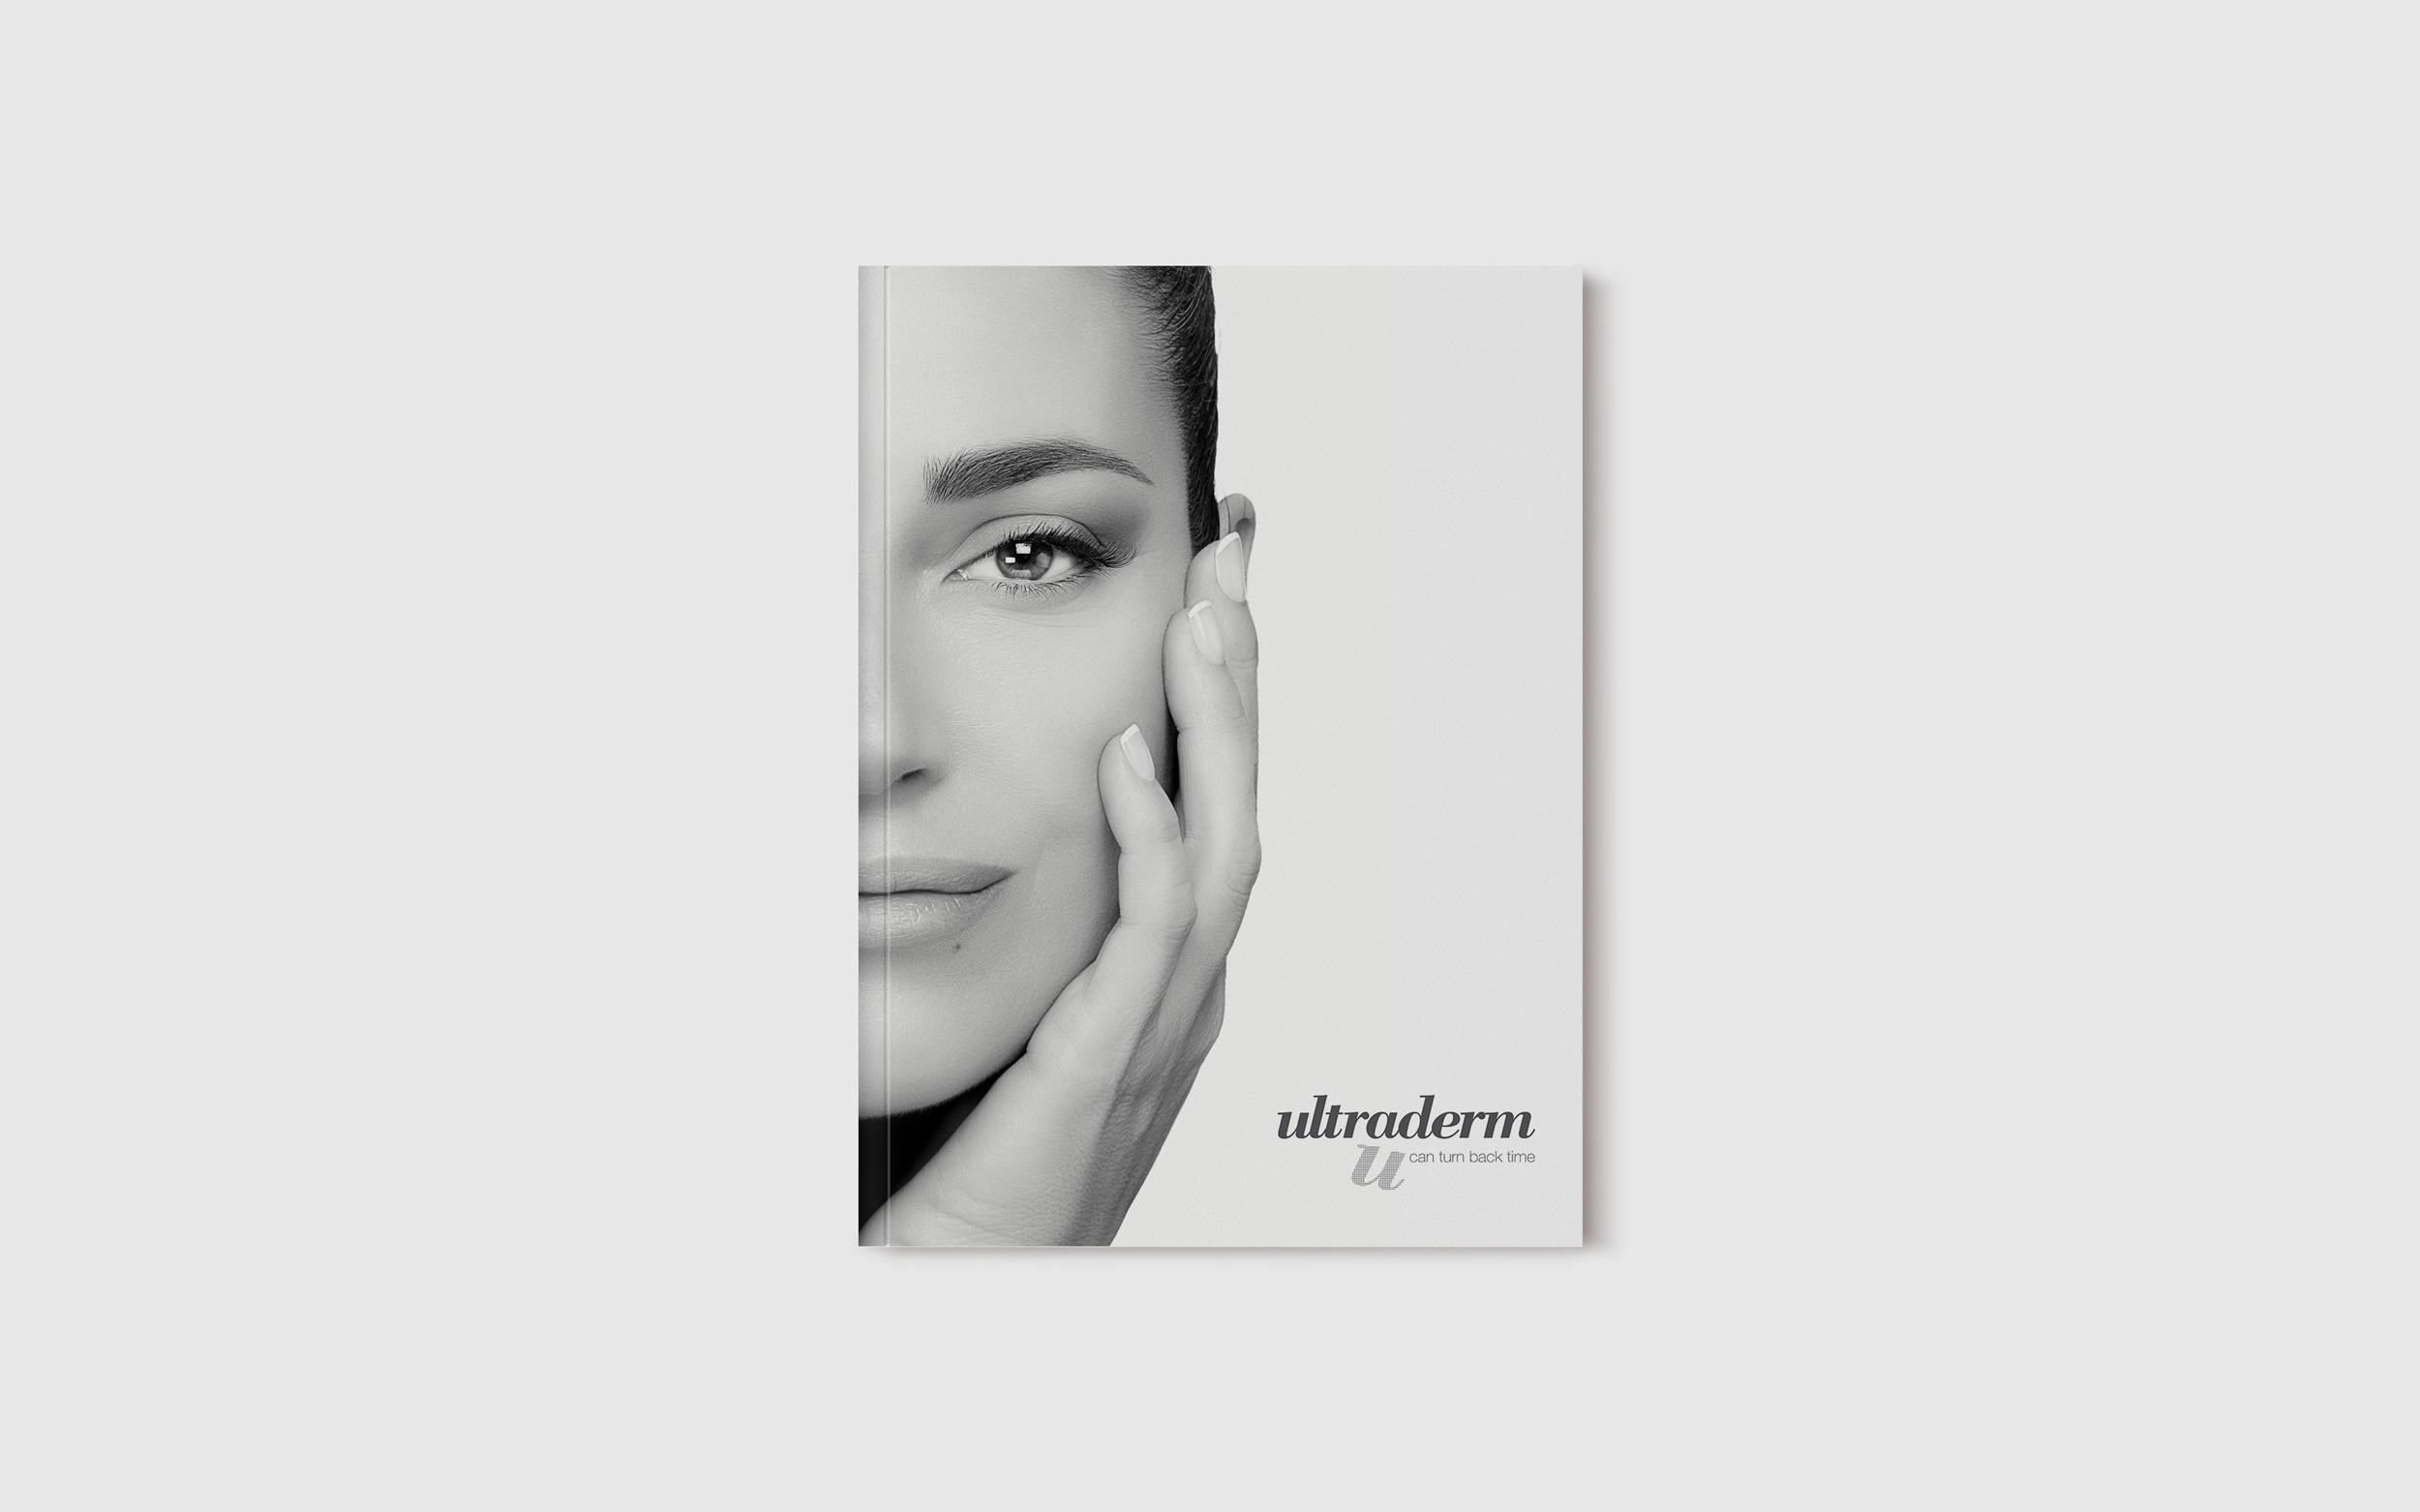 ultraderm-brochure-front.jpg